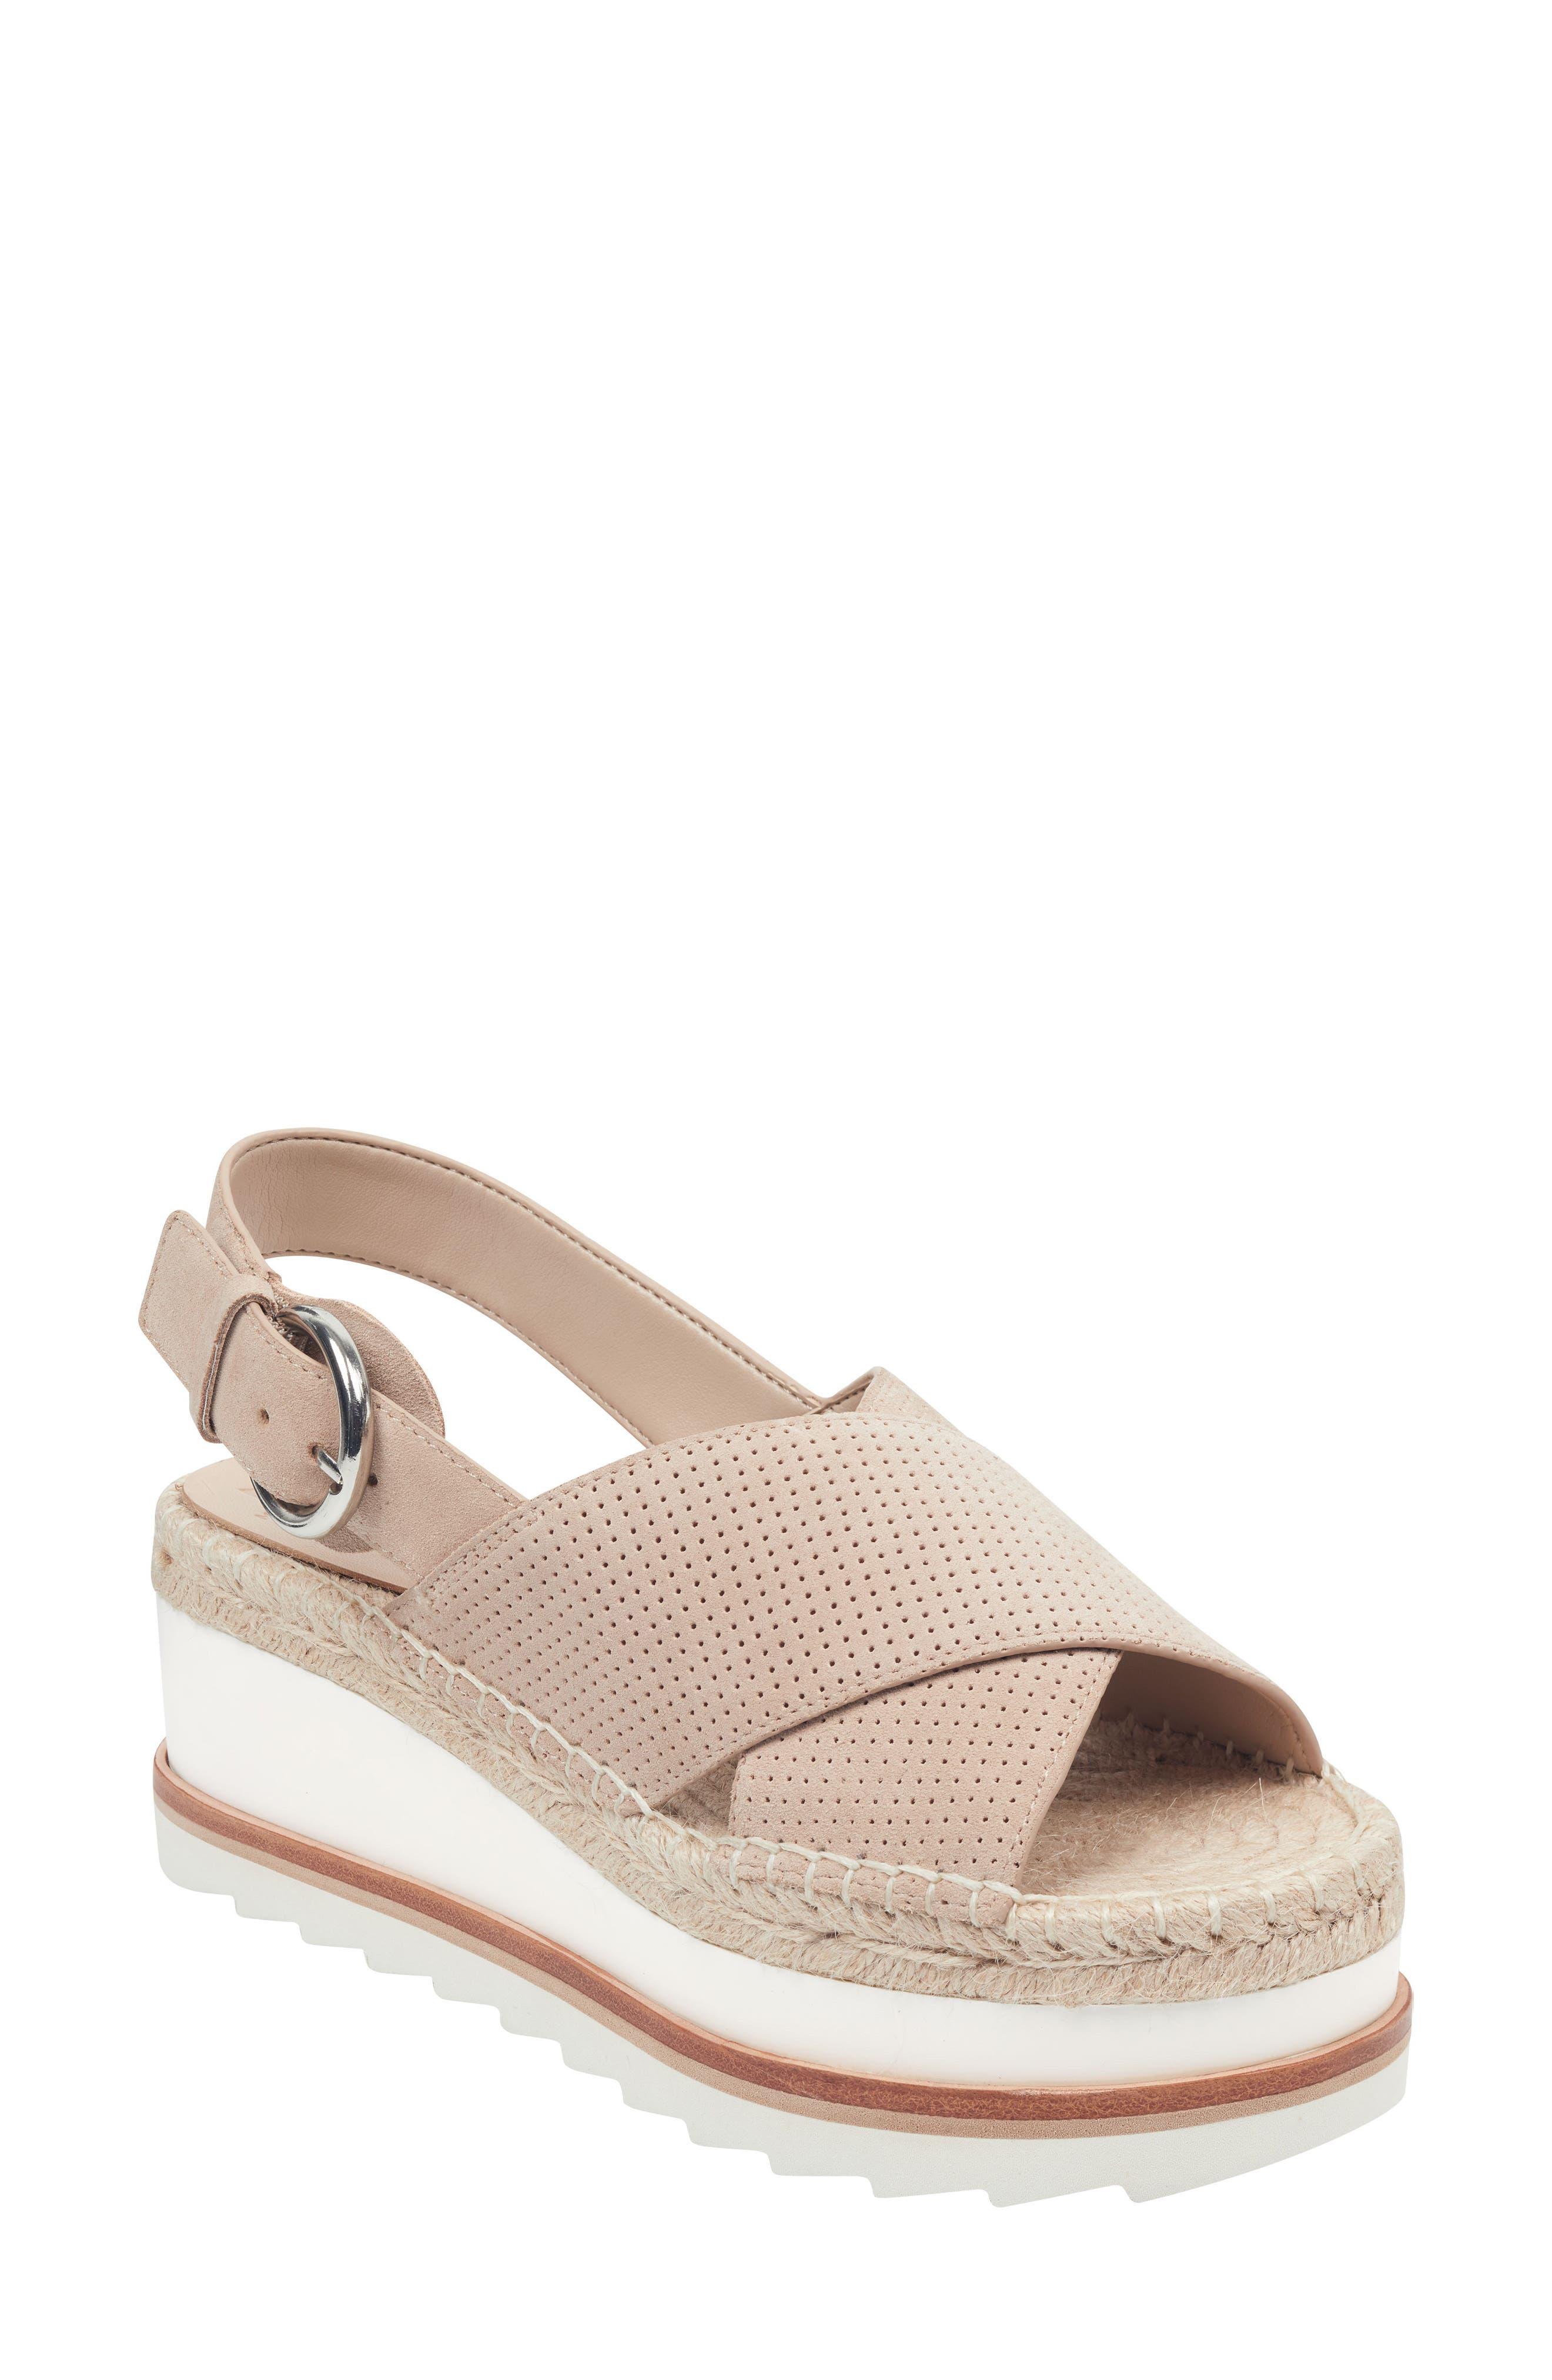 Marc Fisher Ltd Gellyn Slingback Sandal, Brown